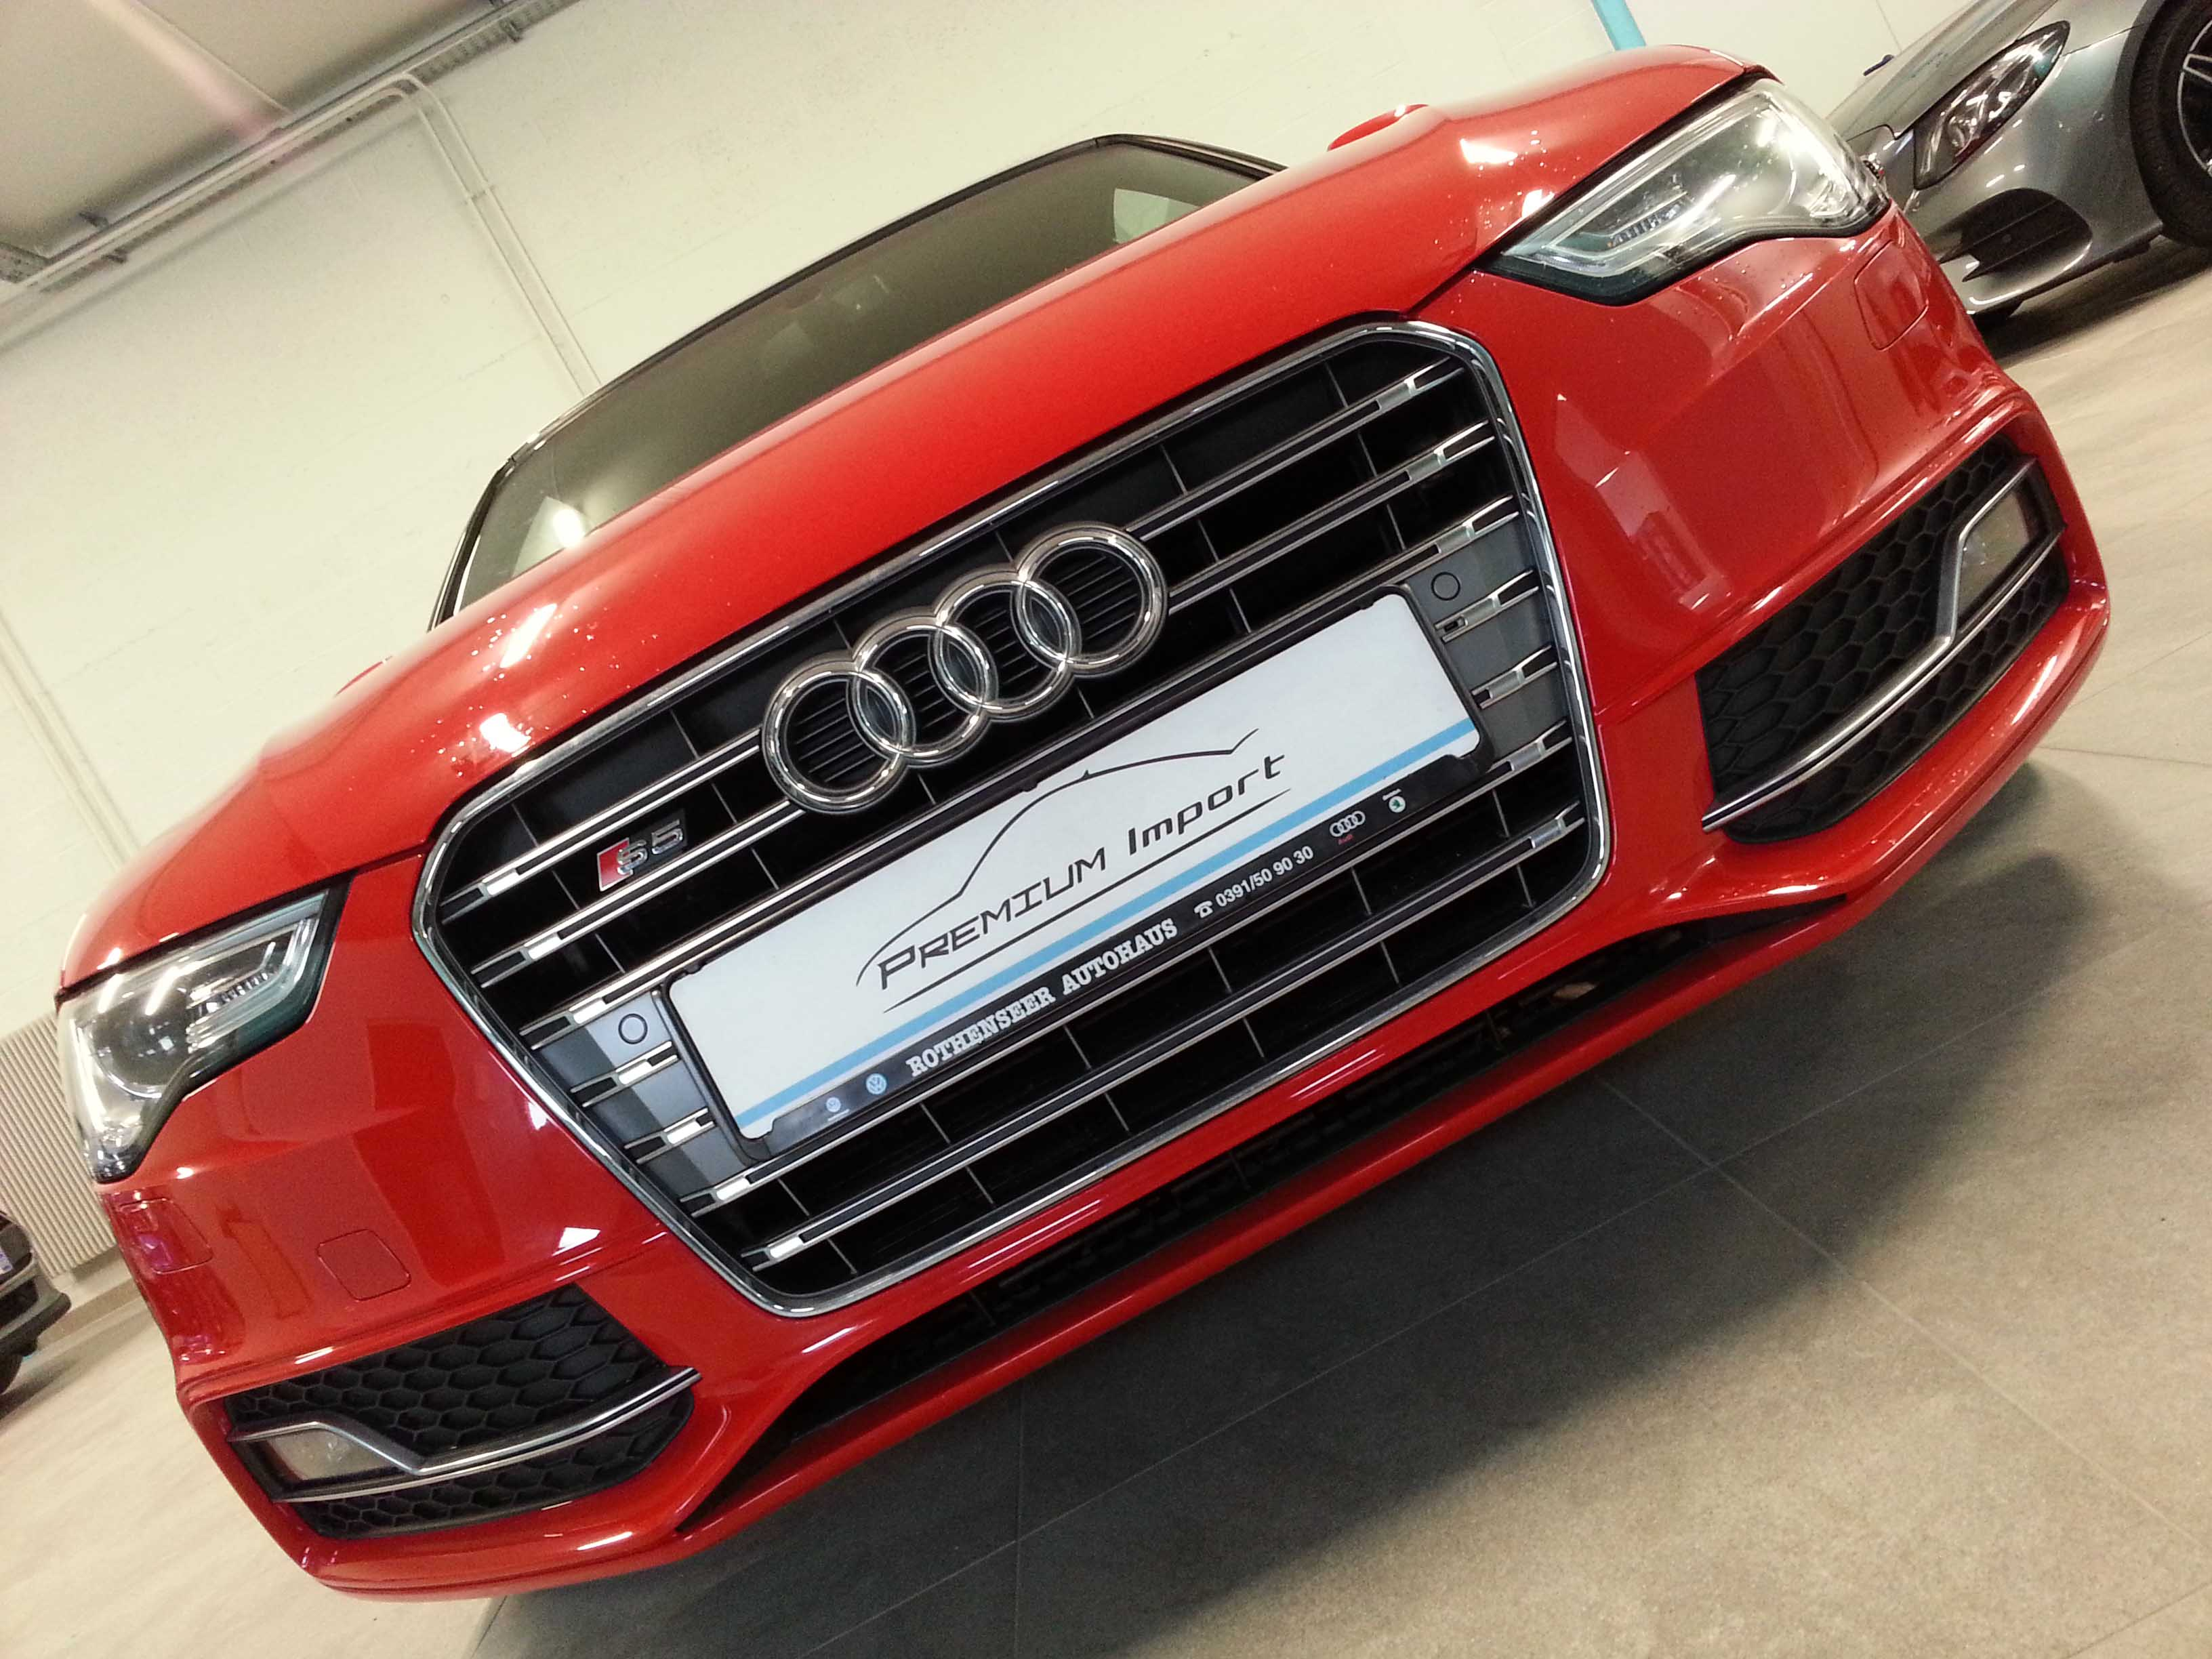 Audi S5 Cabriolet 3.0 TFSI